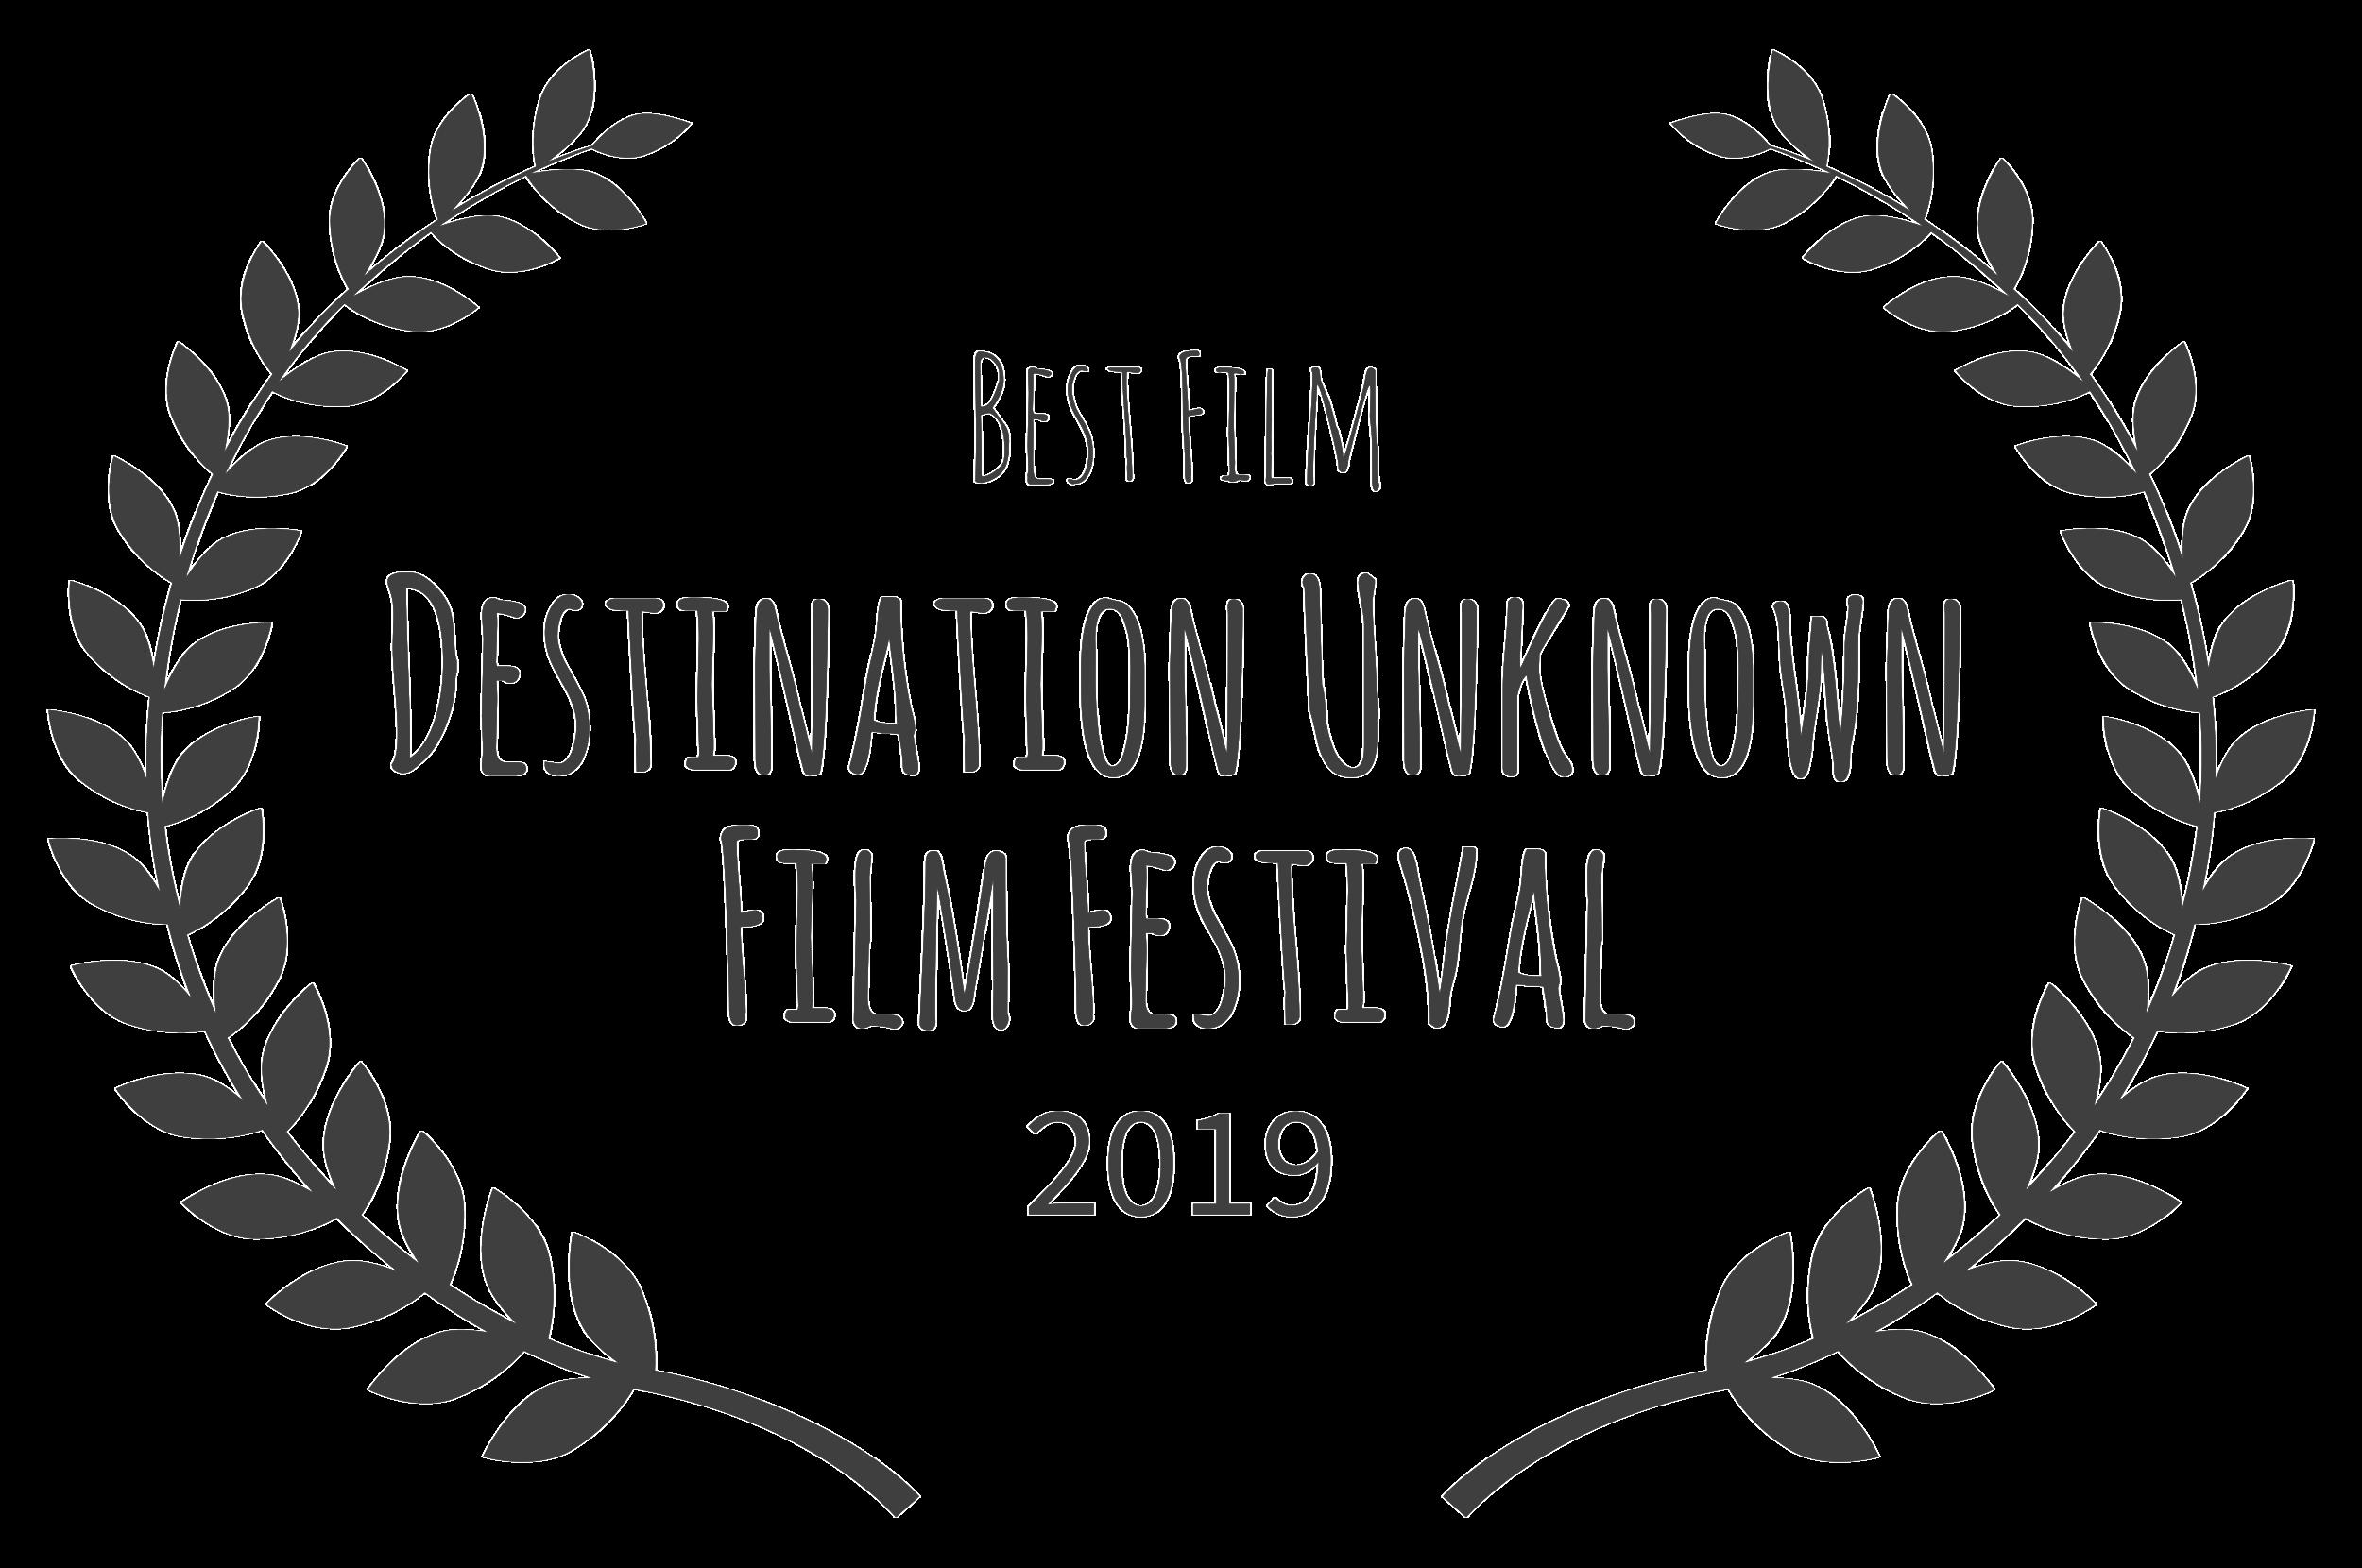 BestFilm-DestinationUnknownFilmFestival-2019.png